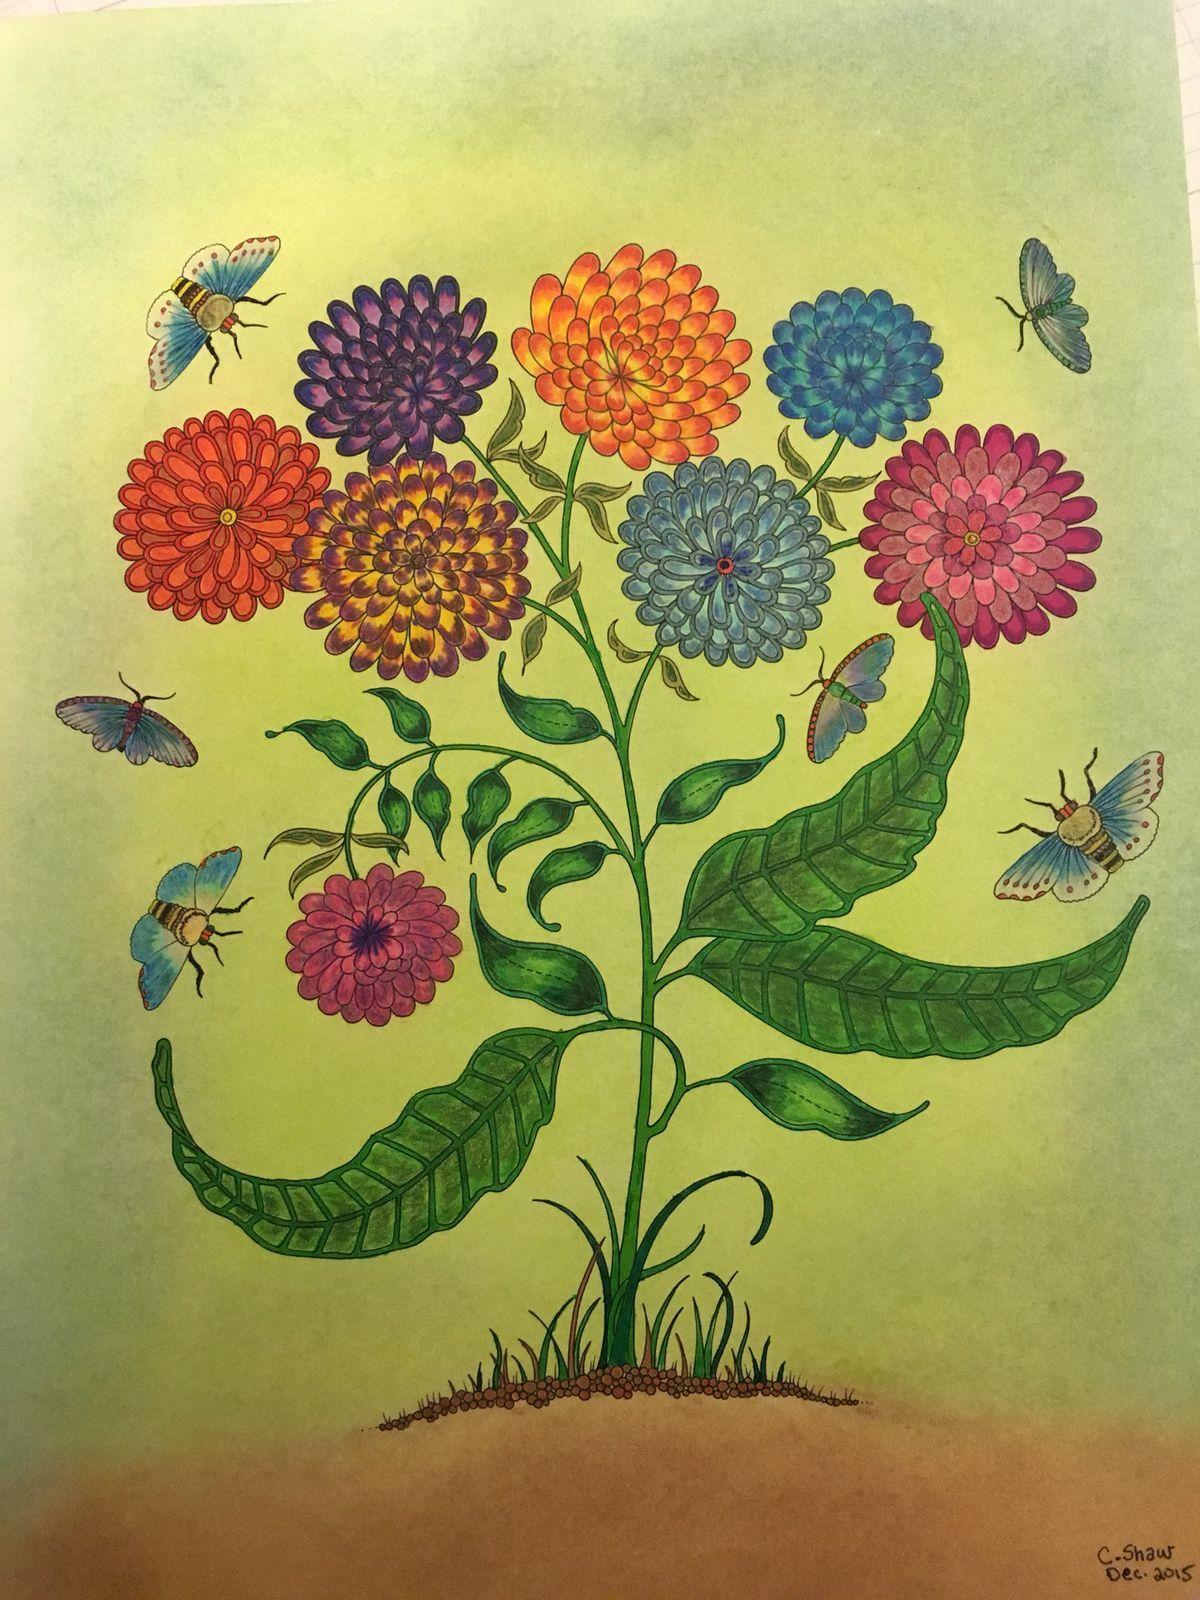 1ec1d2c1f5aaed71dc4b70b5353c940e Jpg 1 200 1 600 Pixels Secret Garden Coloring Book Johanna Basford Coloring Johanna Basford Secret Garden